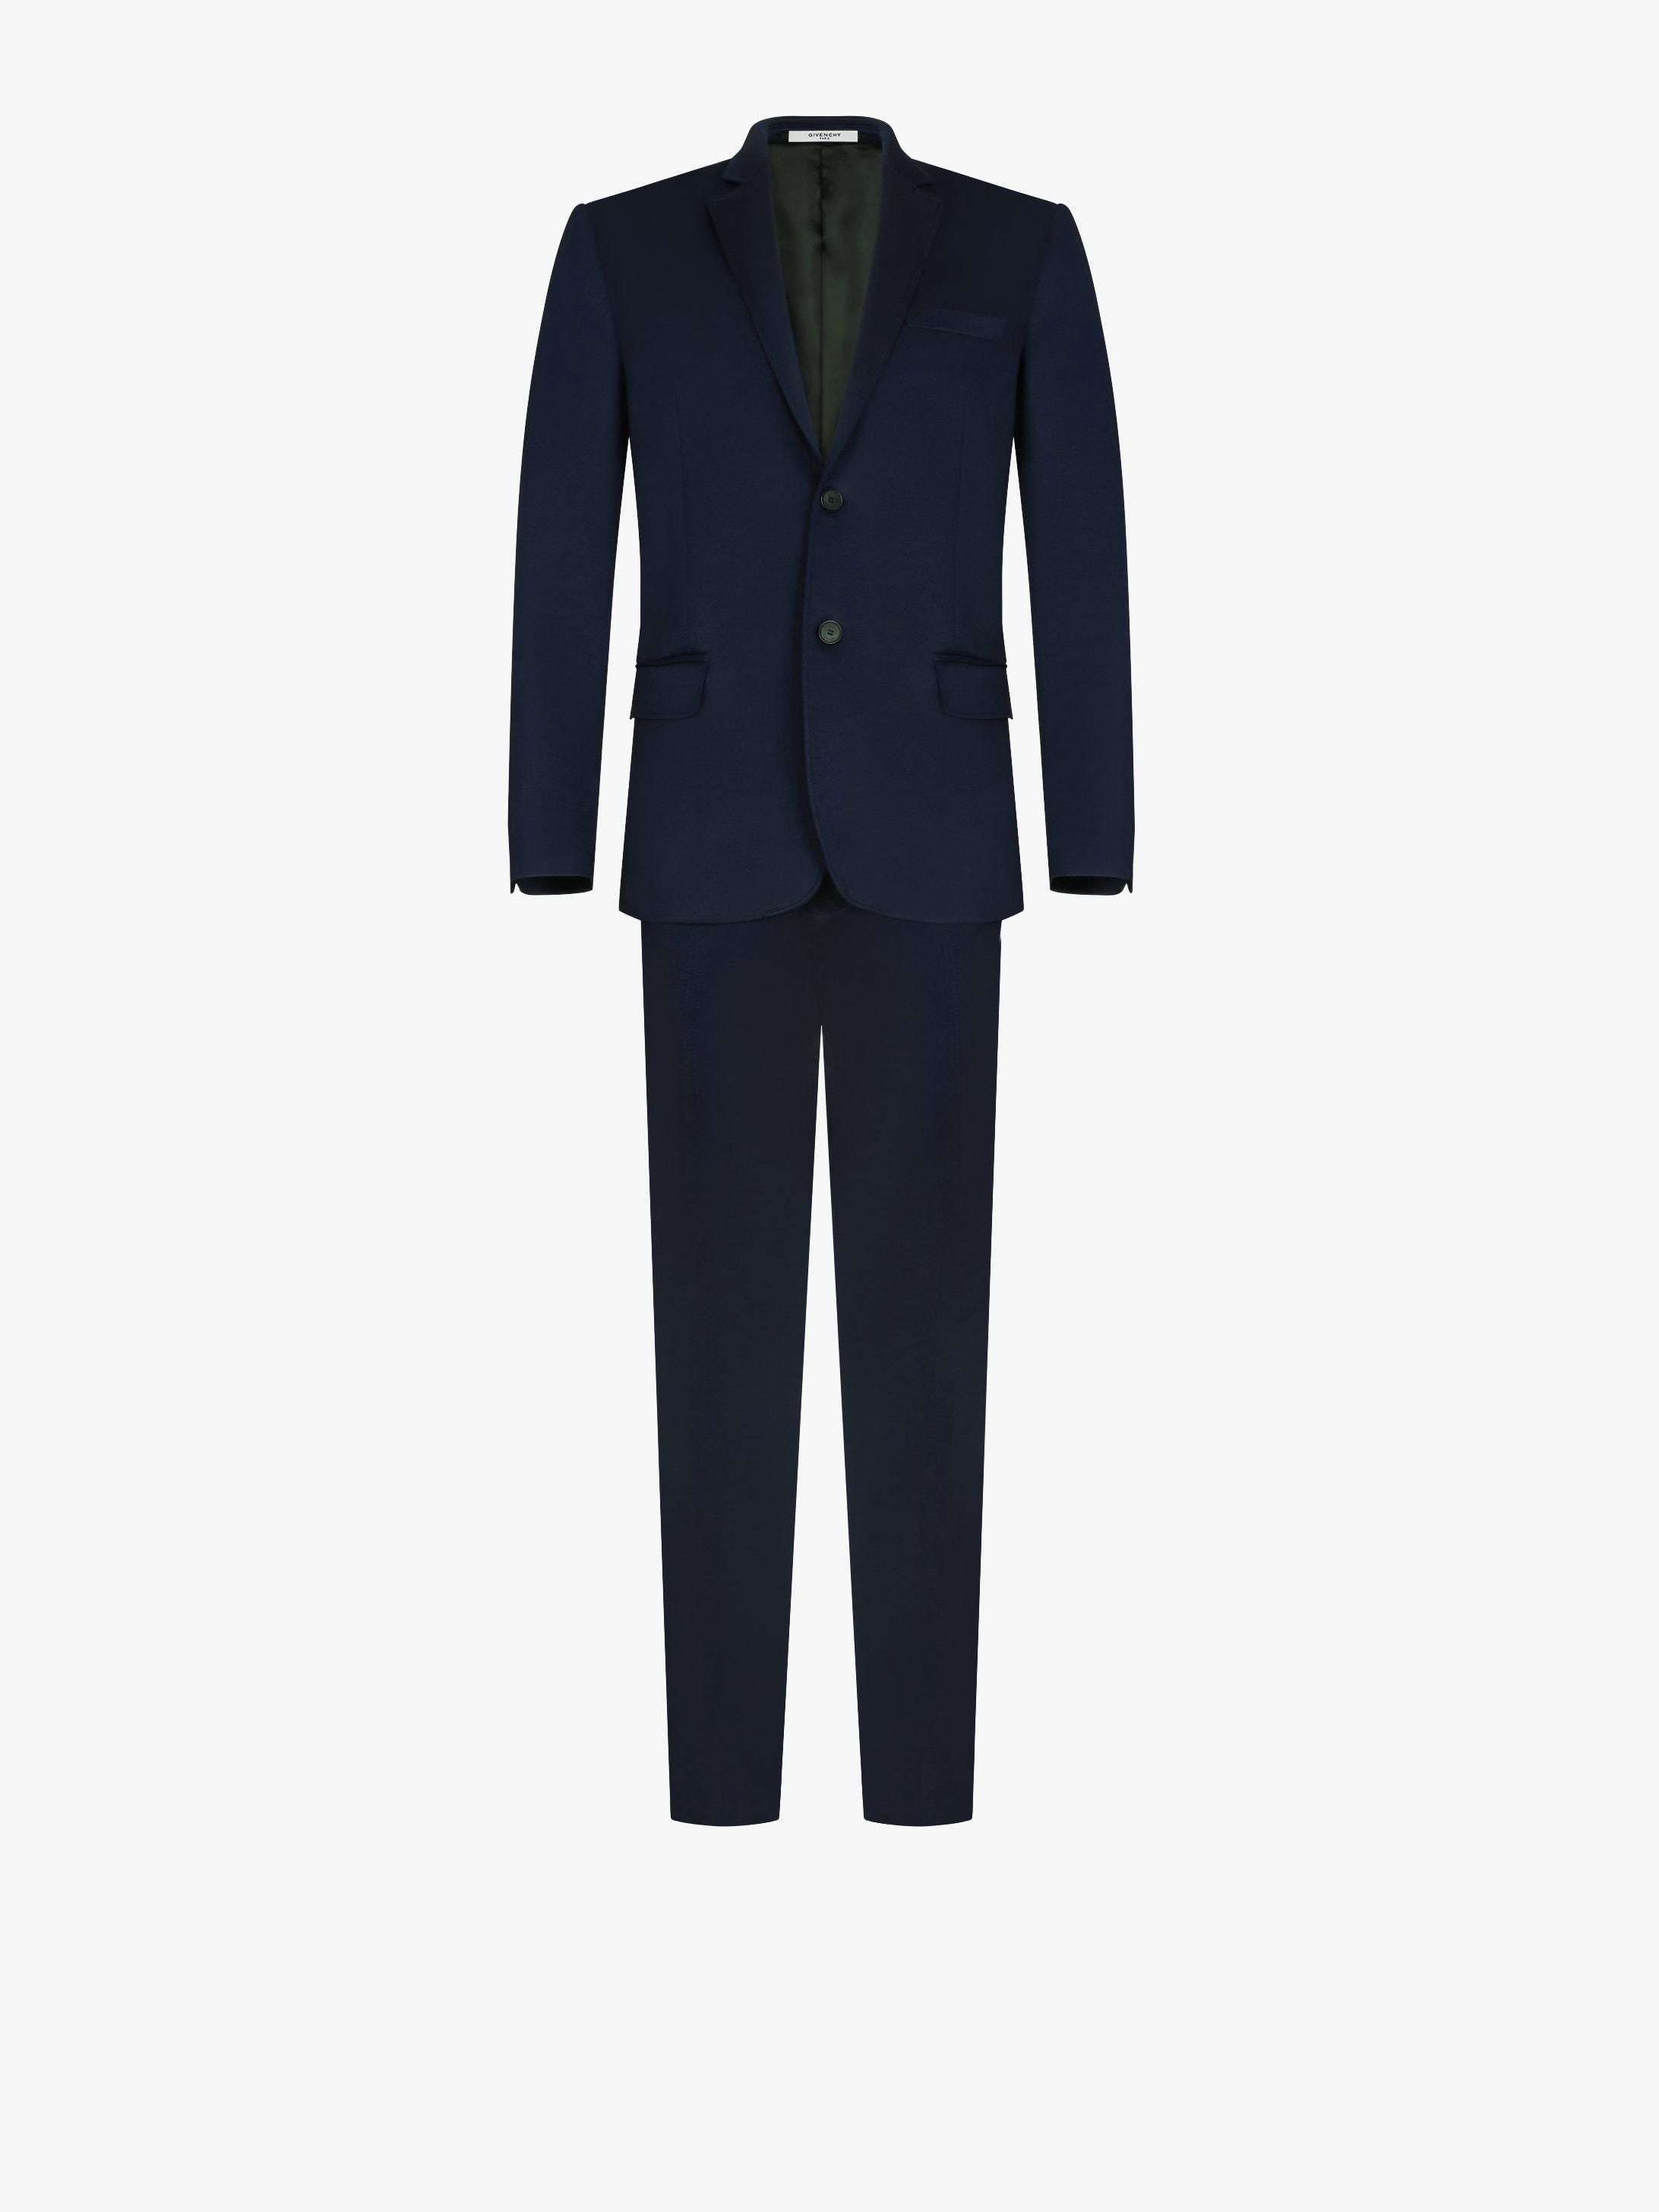 Regular fit supple jersey suit